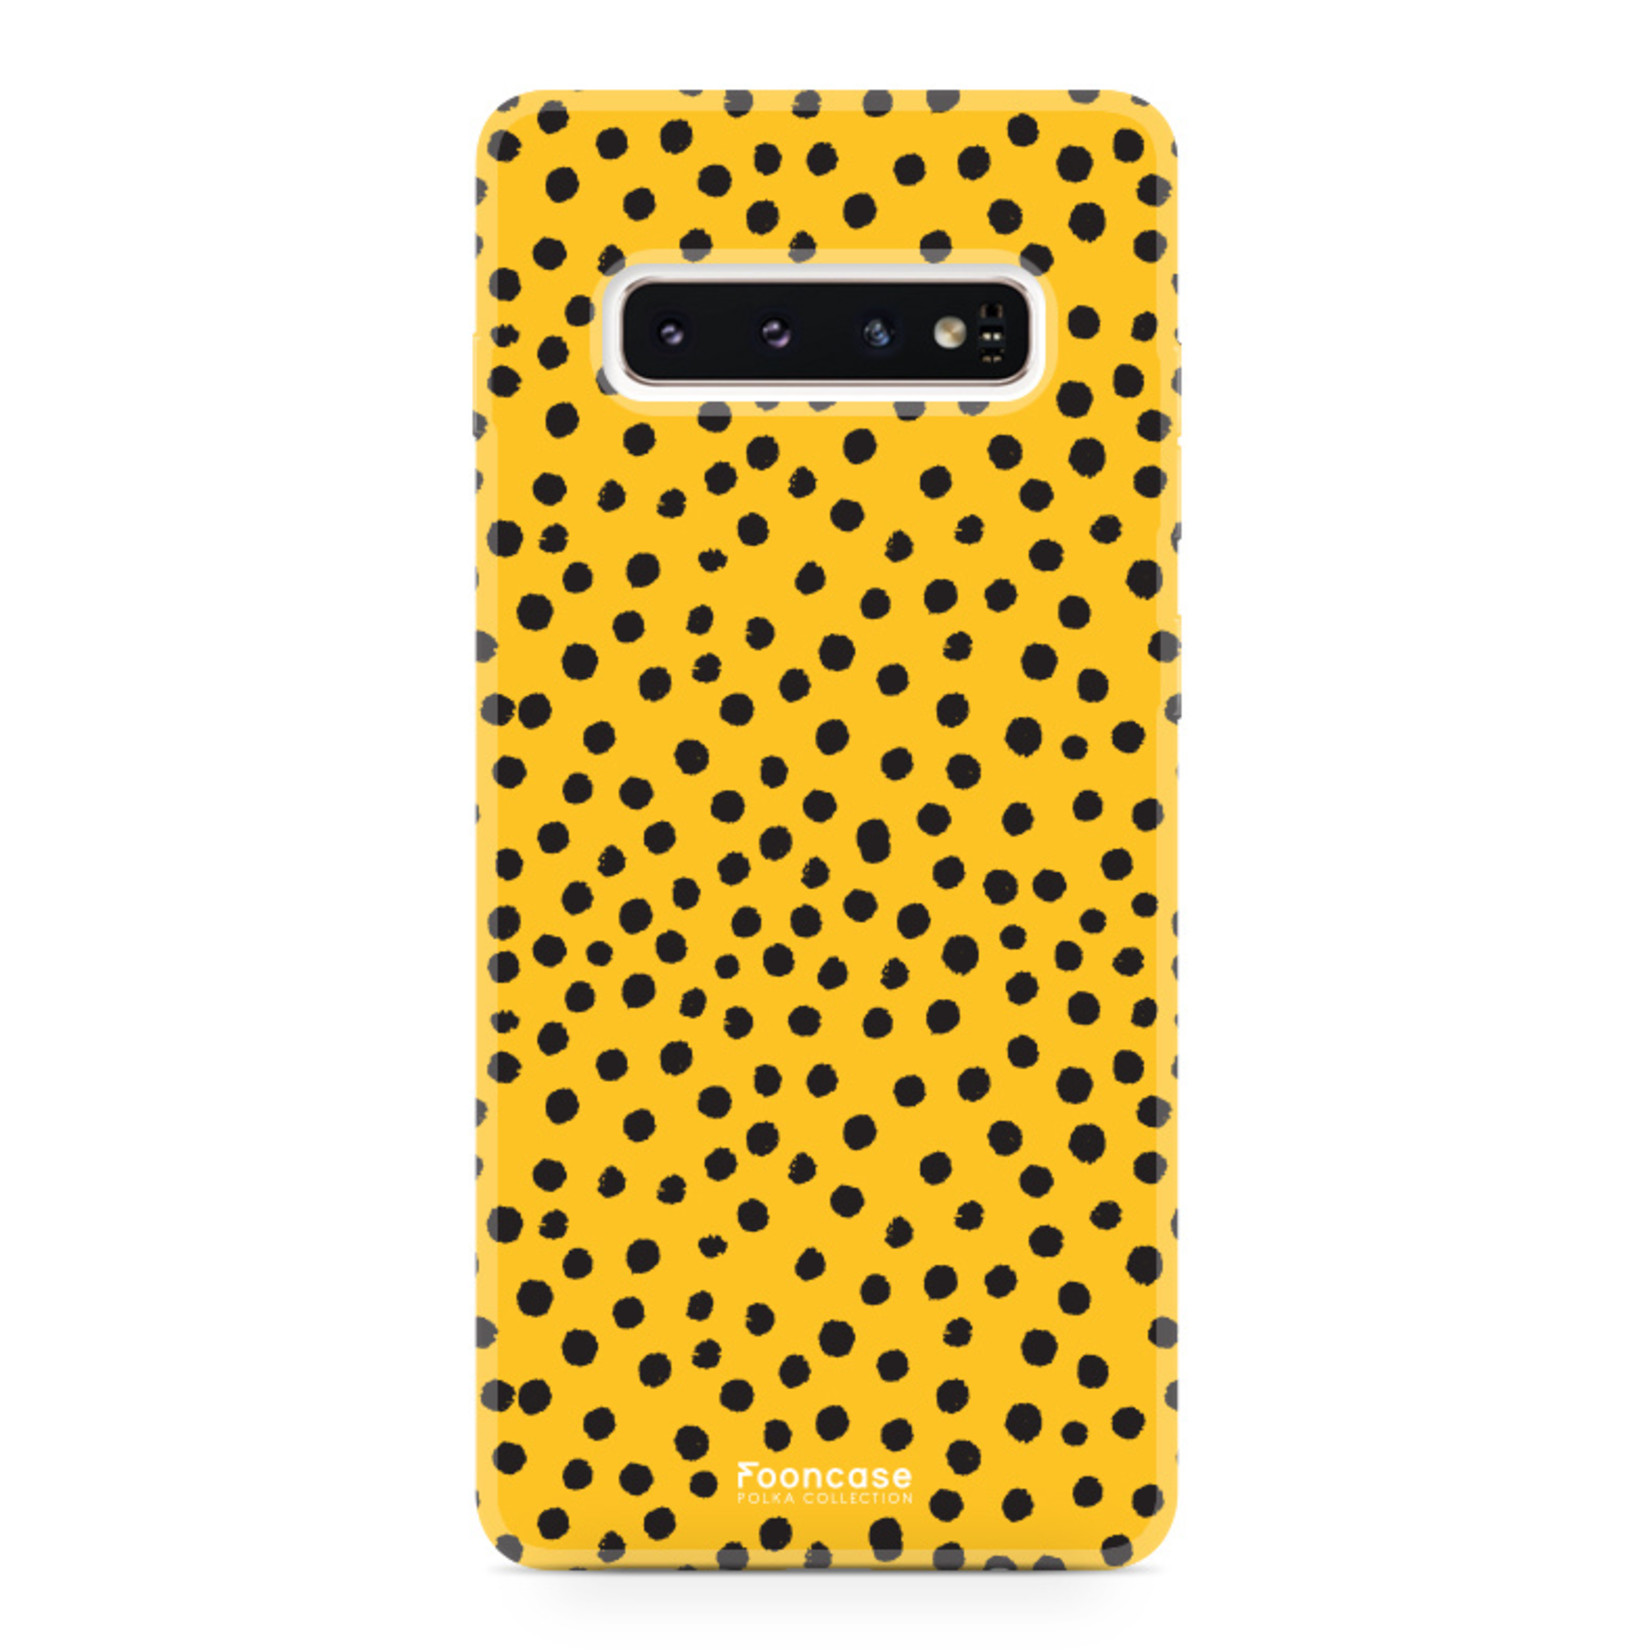 FOONCASE Samsung Galaxy S10 hoesje TPU Soft Case - Back Cover - POLKA COLLECTION / Stipjes / Stippen / Oker Geel